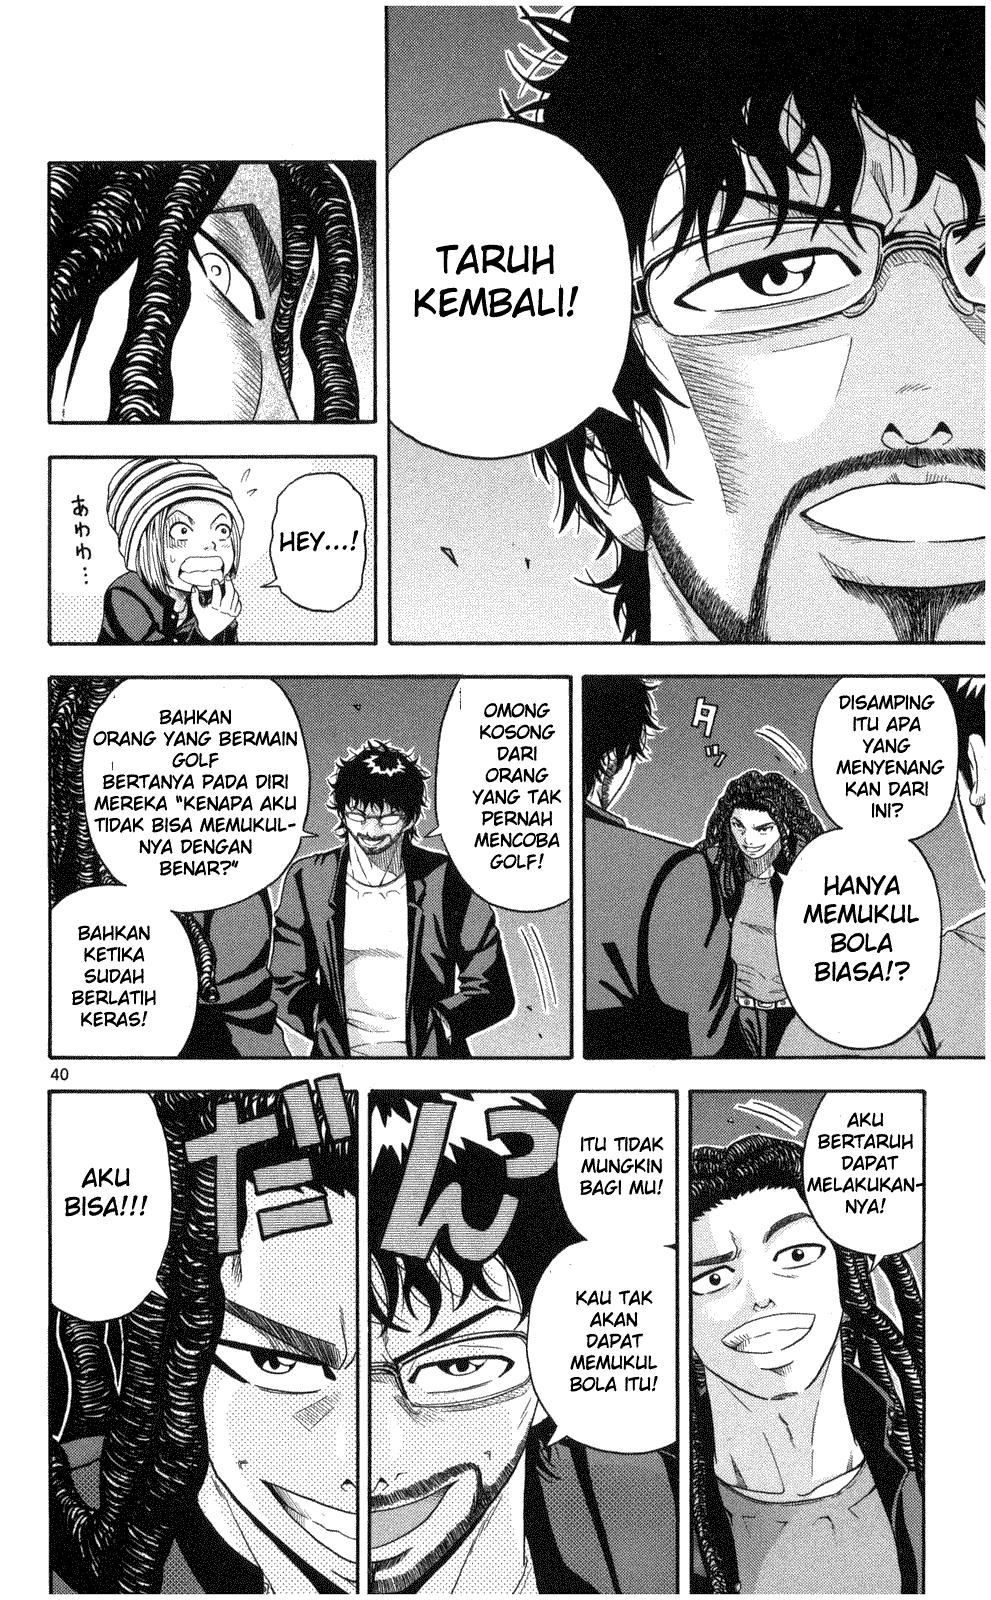 Komik king golf 001 - chapter 1 2 Indonesia king golf 001 - chapter 1 Terbaru 40|Baca Manga Komik Indonesia|